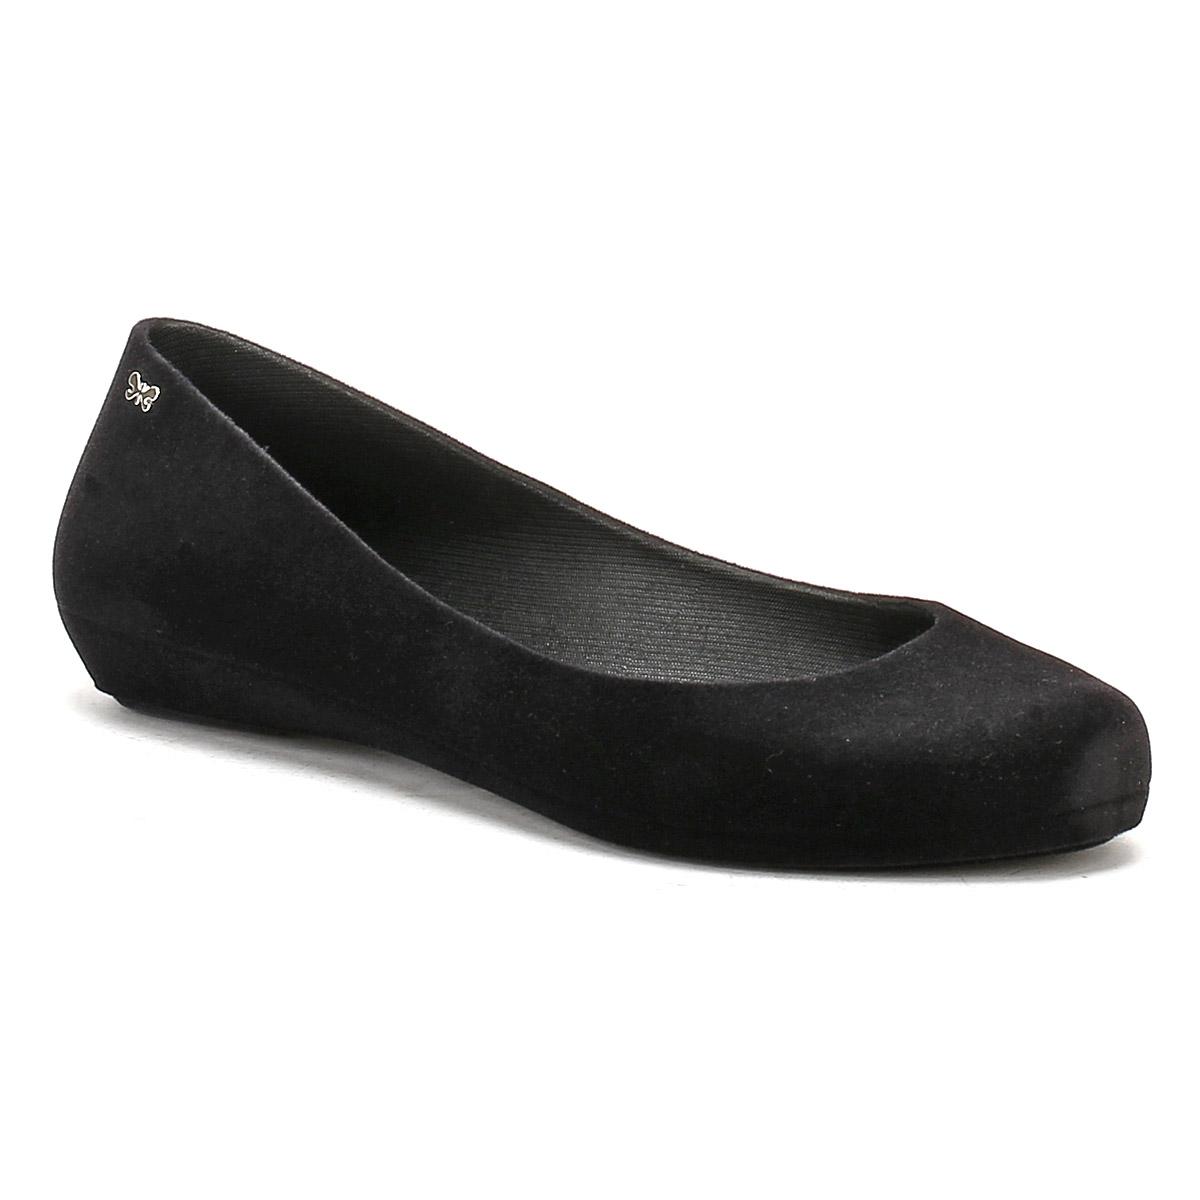 44f7aca9a0f Zaxy Pop Flock 2 Black Ladies Flat Ballerina Pump Vegan Shoe UK 5 ...